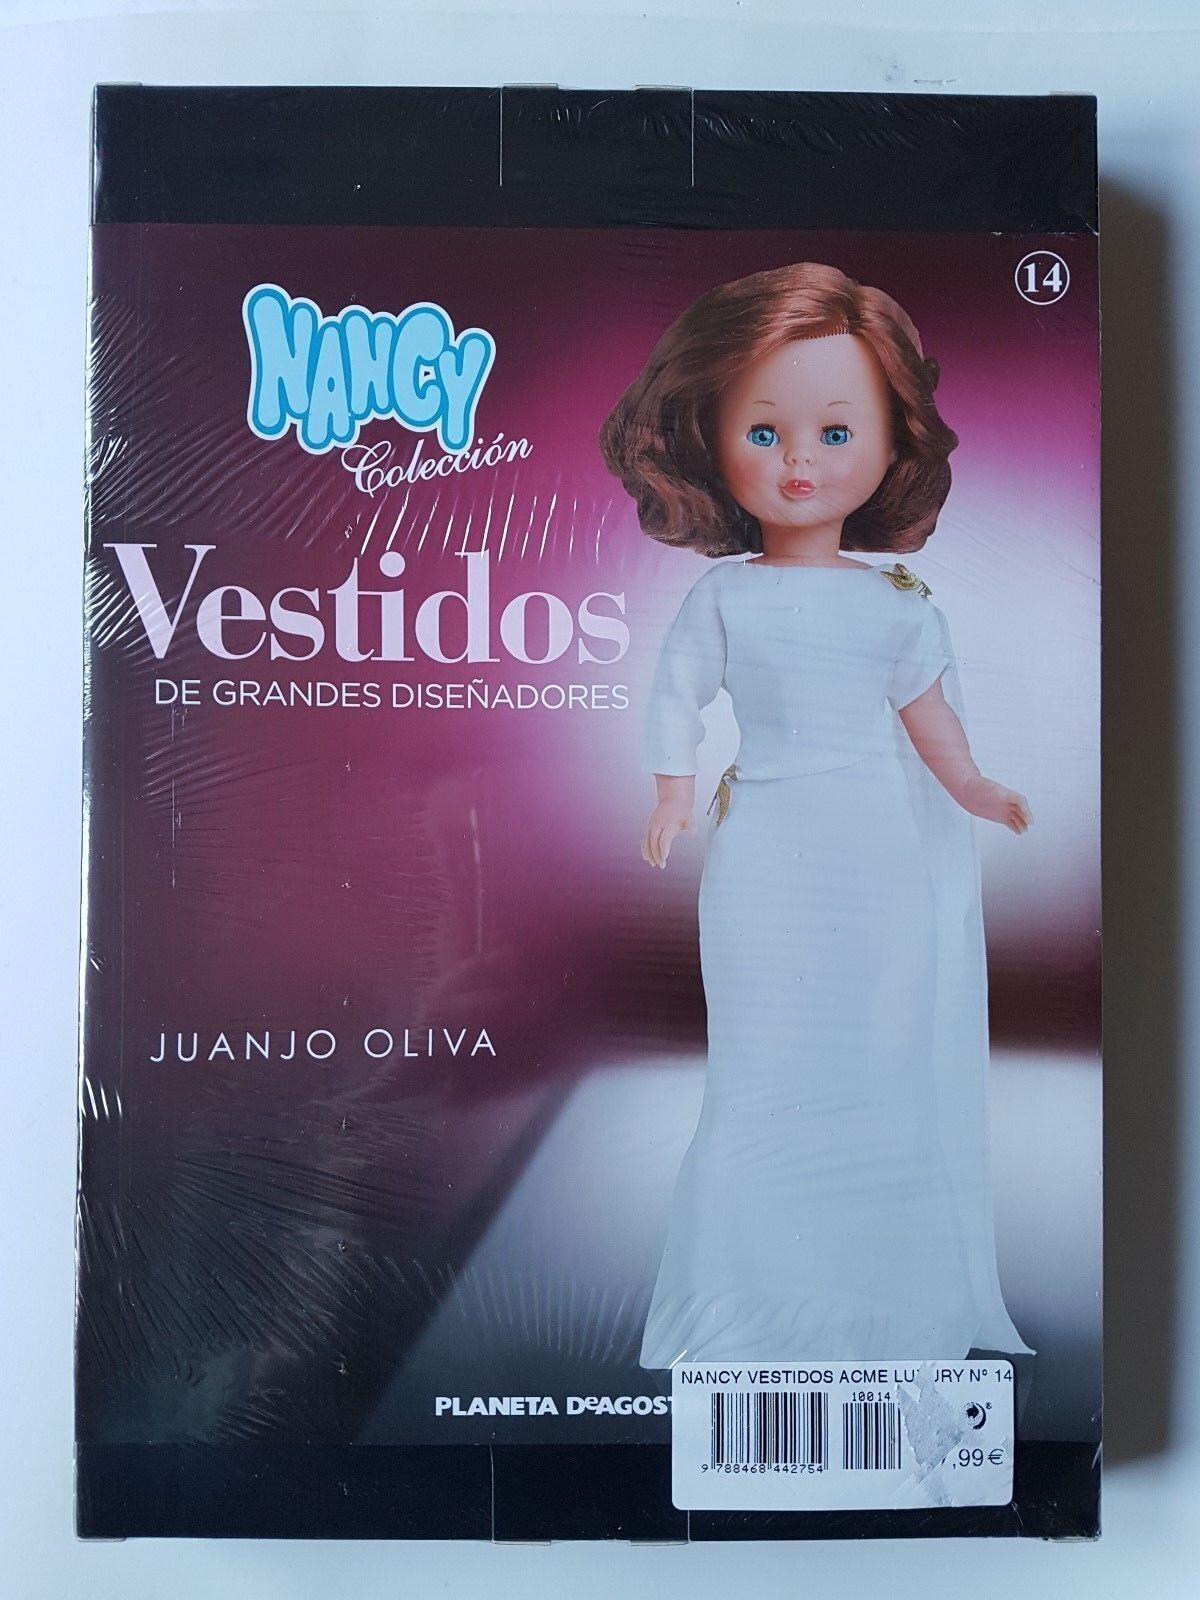 Dolls Nancy Collection Dresses Big Big Big Designers Dress Nº 14 Juanjo Olive a294de